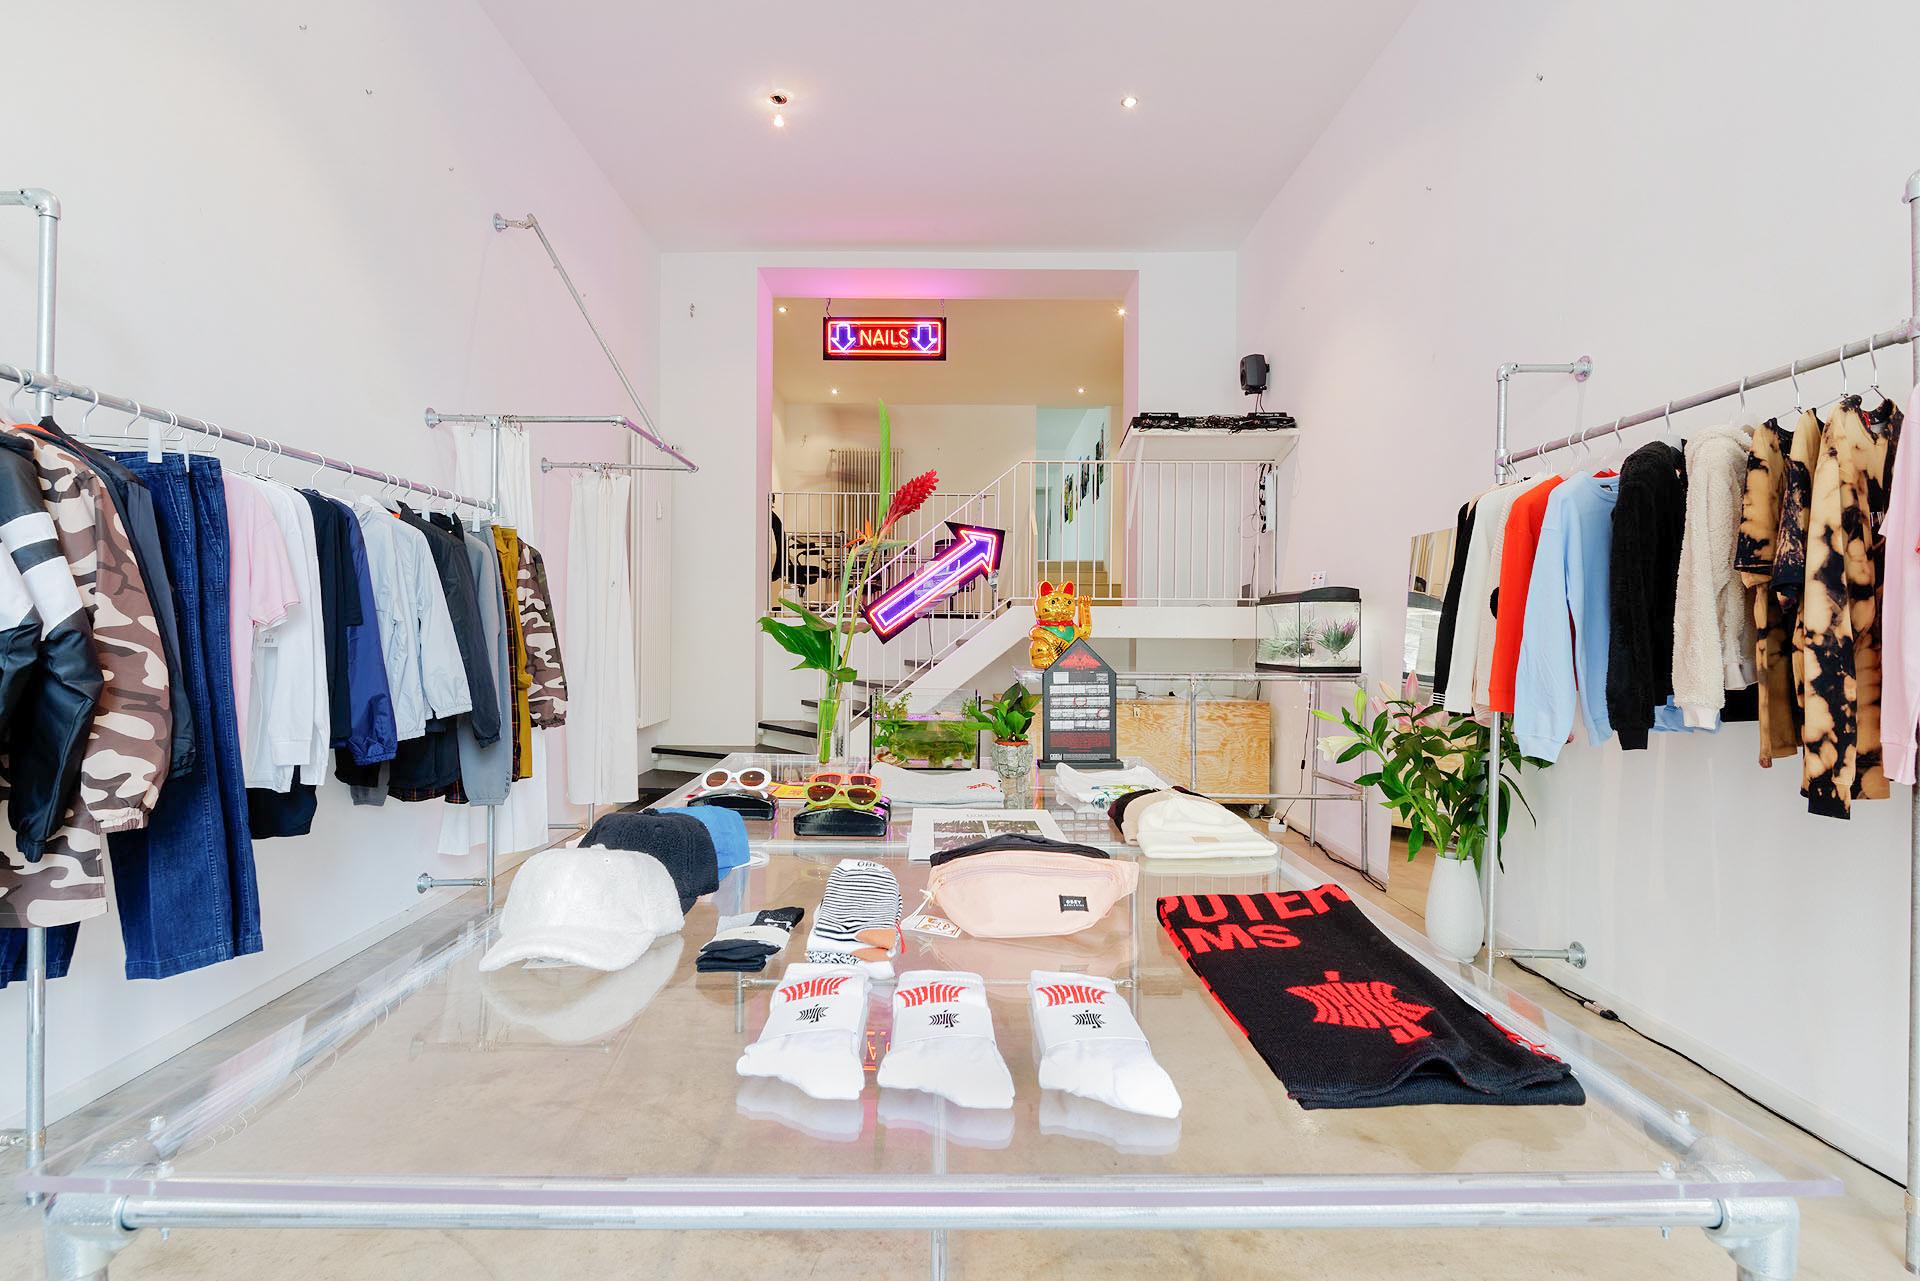 ISLA's shop interior, located at Inselstraße 13, 10179 Berlin